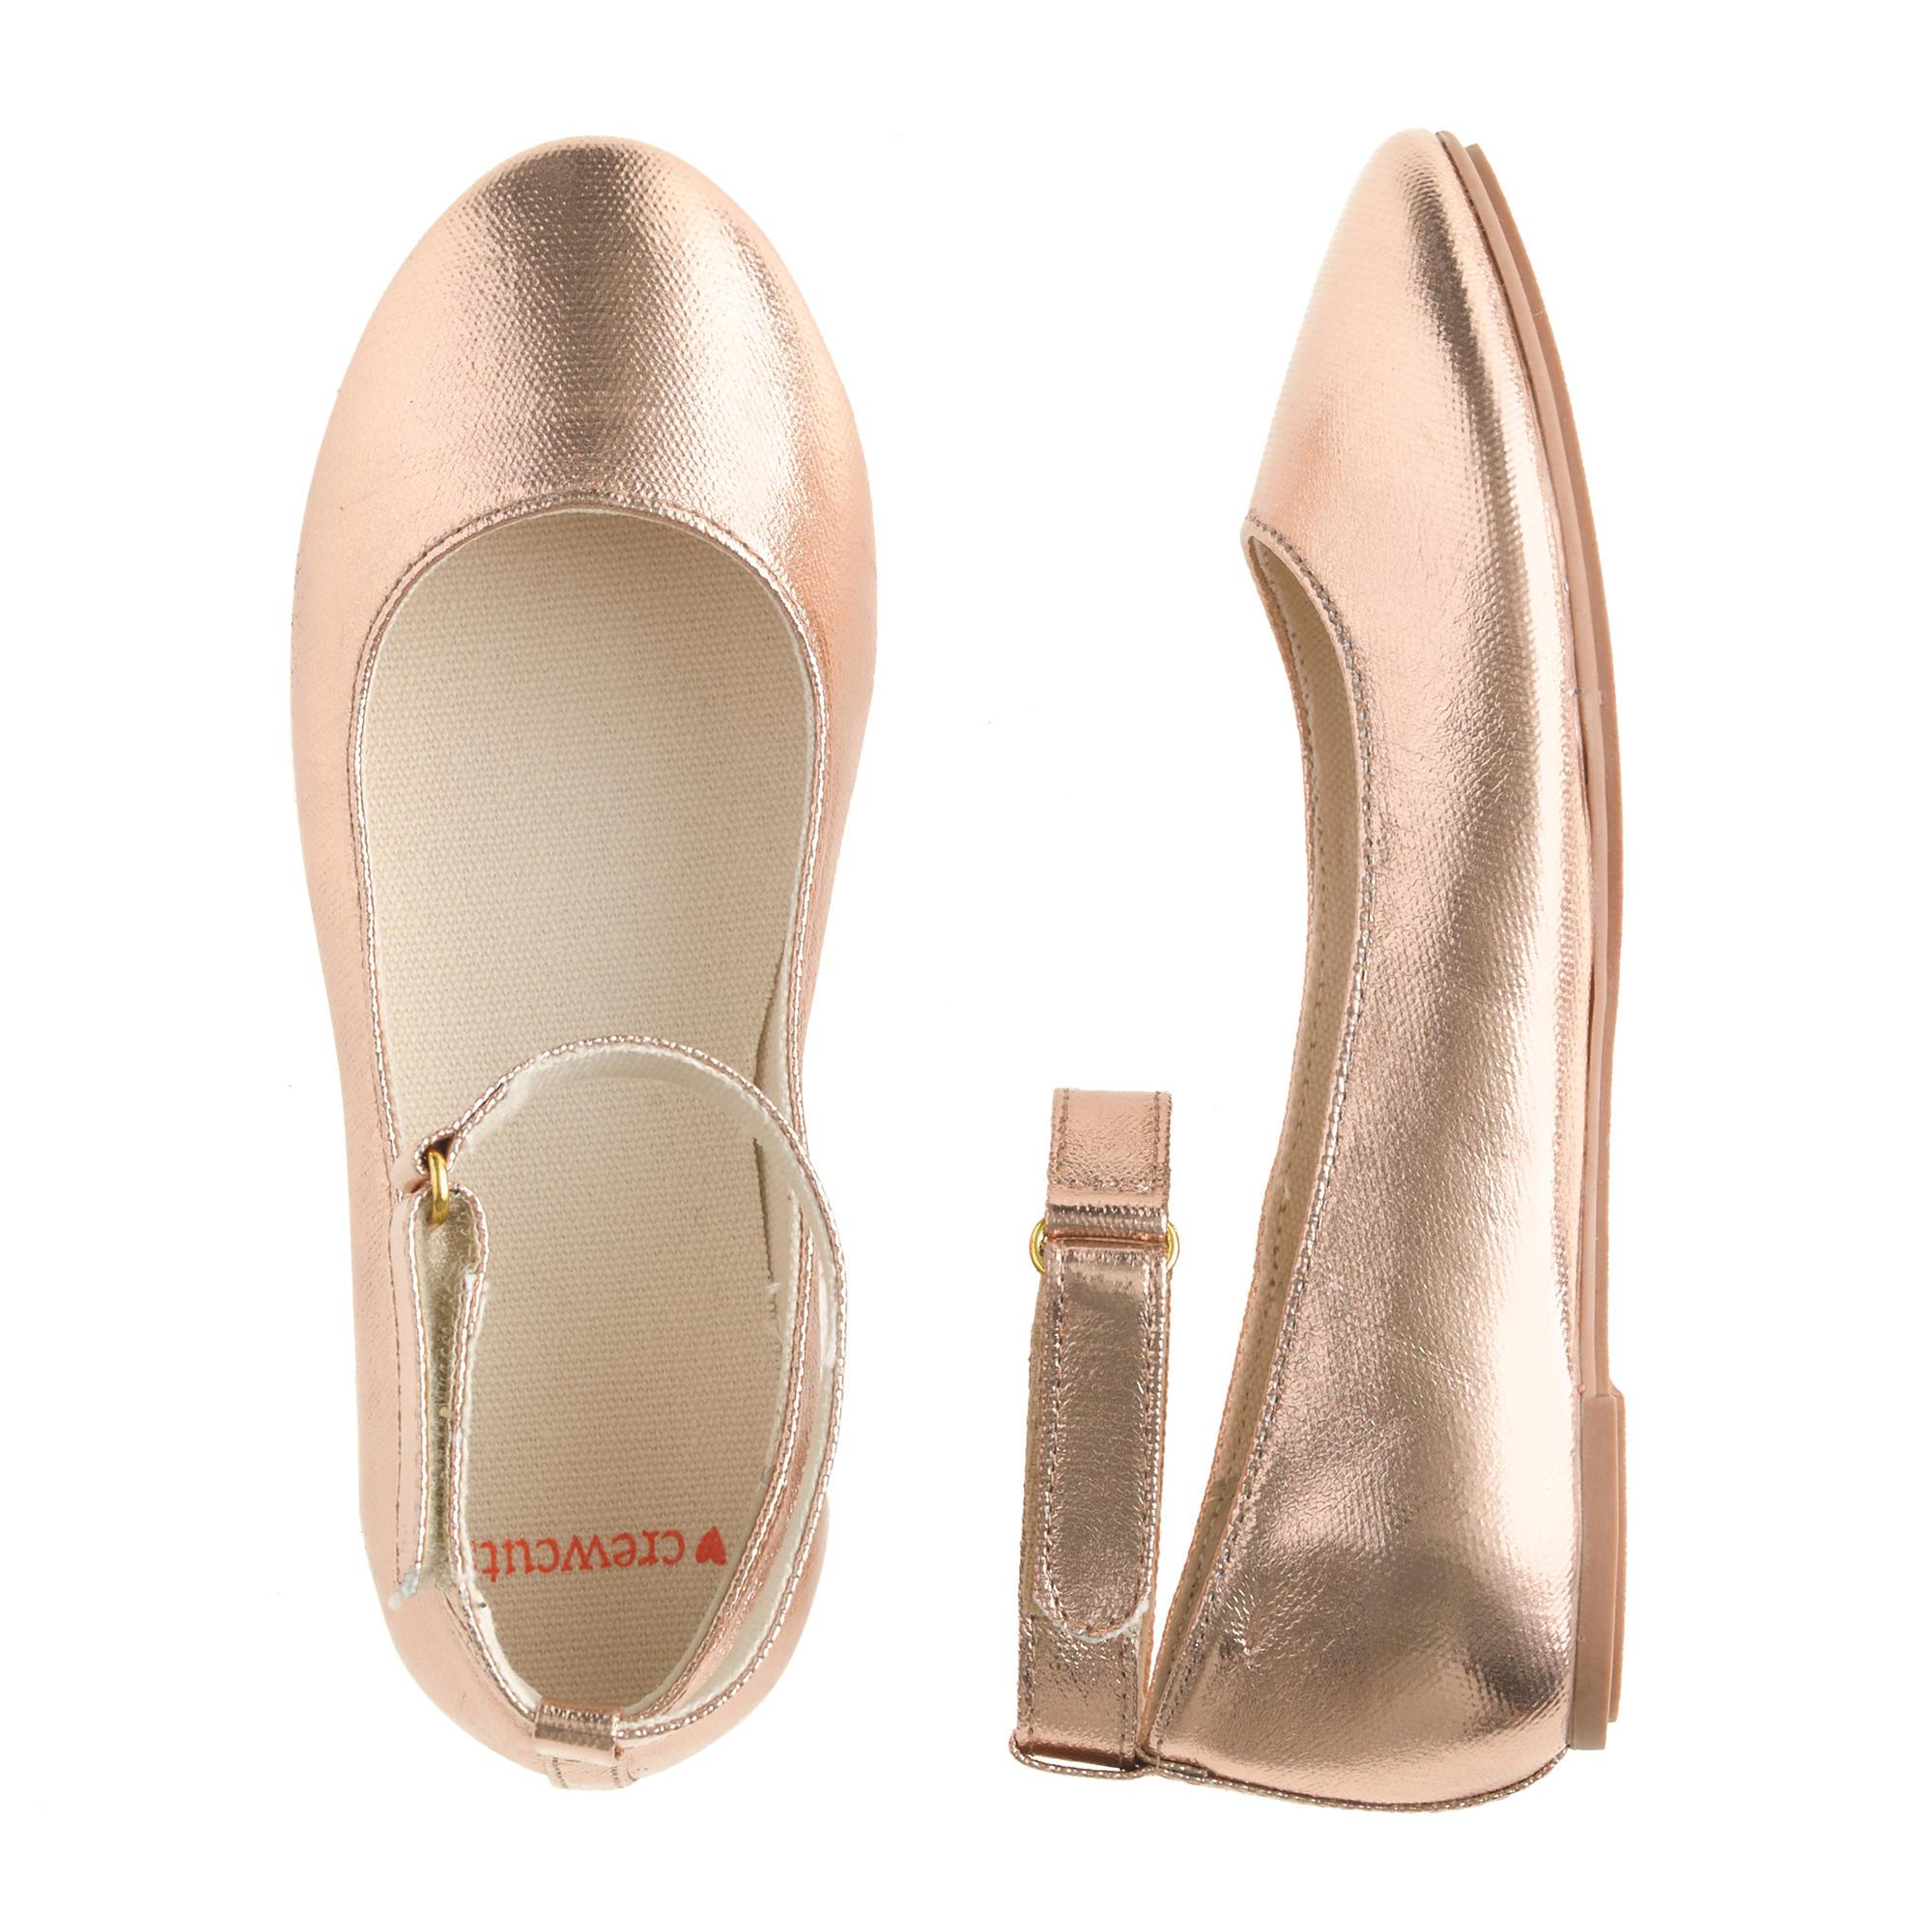 Girls Ivory Dress Shoes